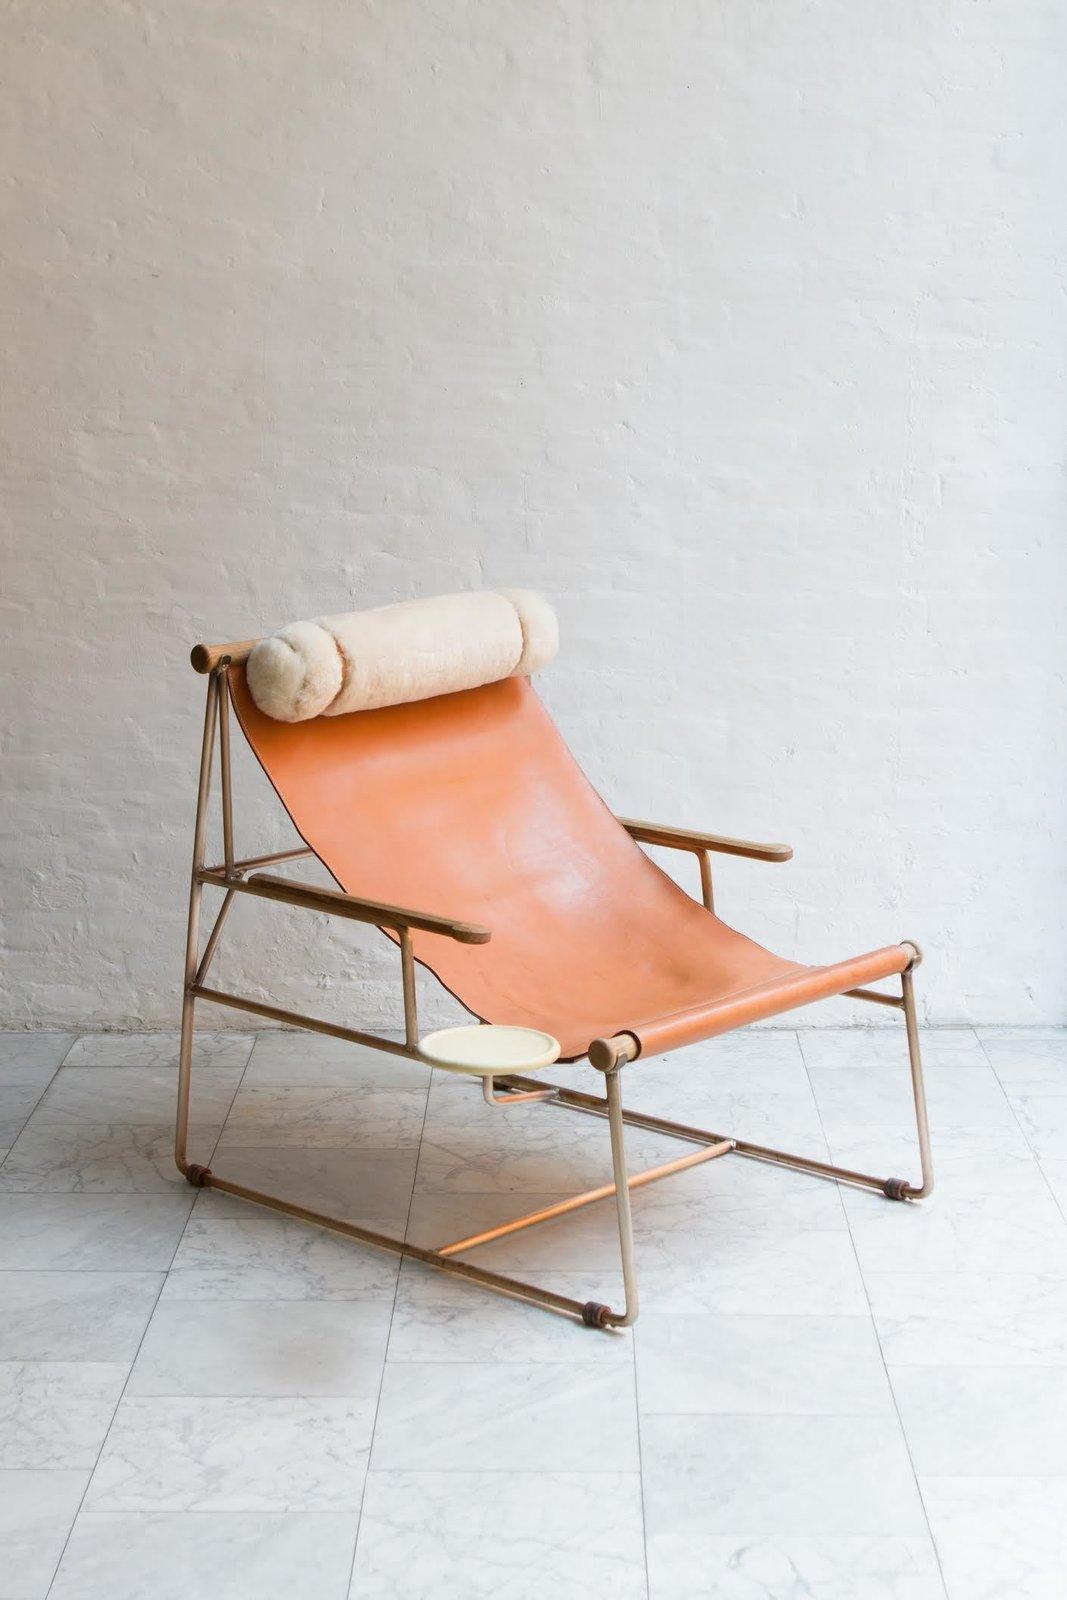 #seatingdesign #leather #tile   100+ Best Modern Seating Designs